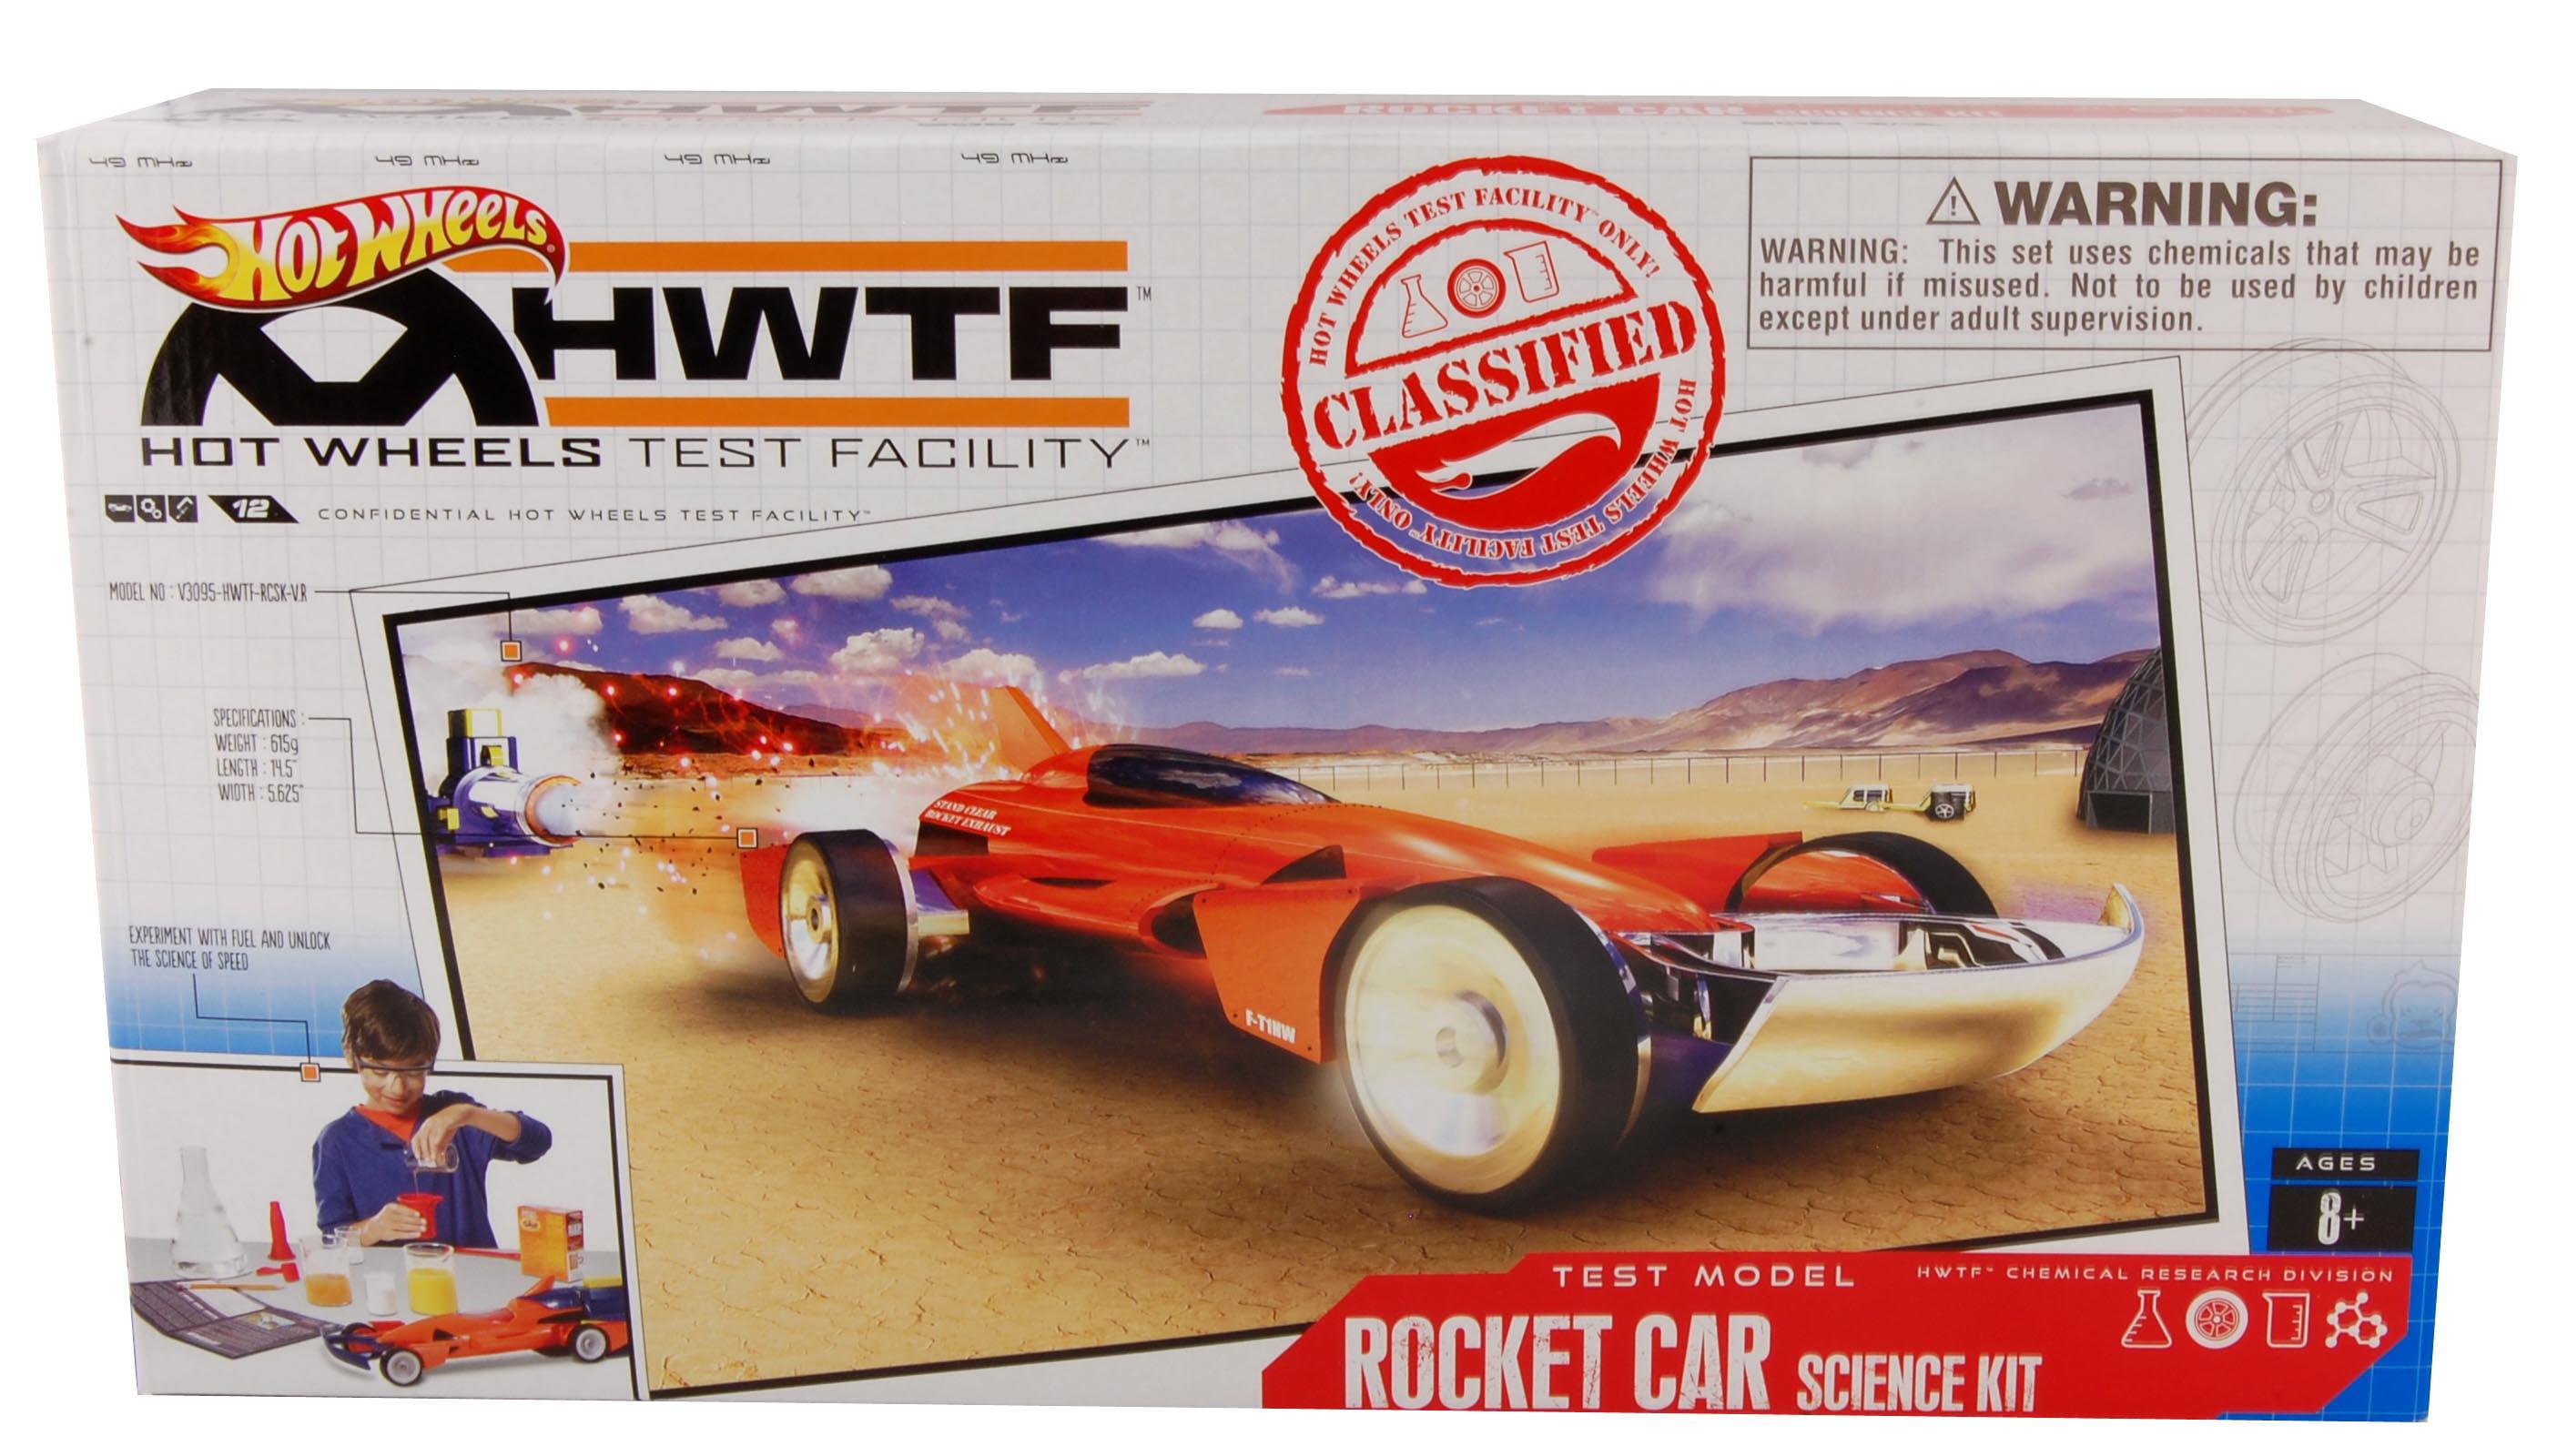 Hot Wheels Test Facility Rocket Car Science Kit   Walmart Canada